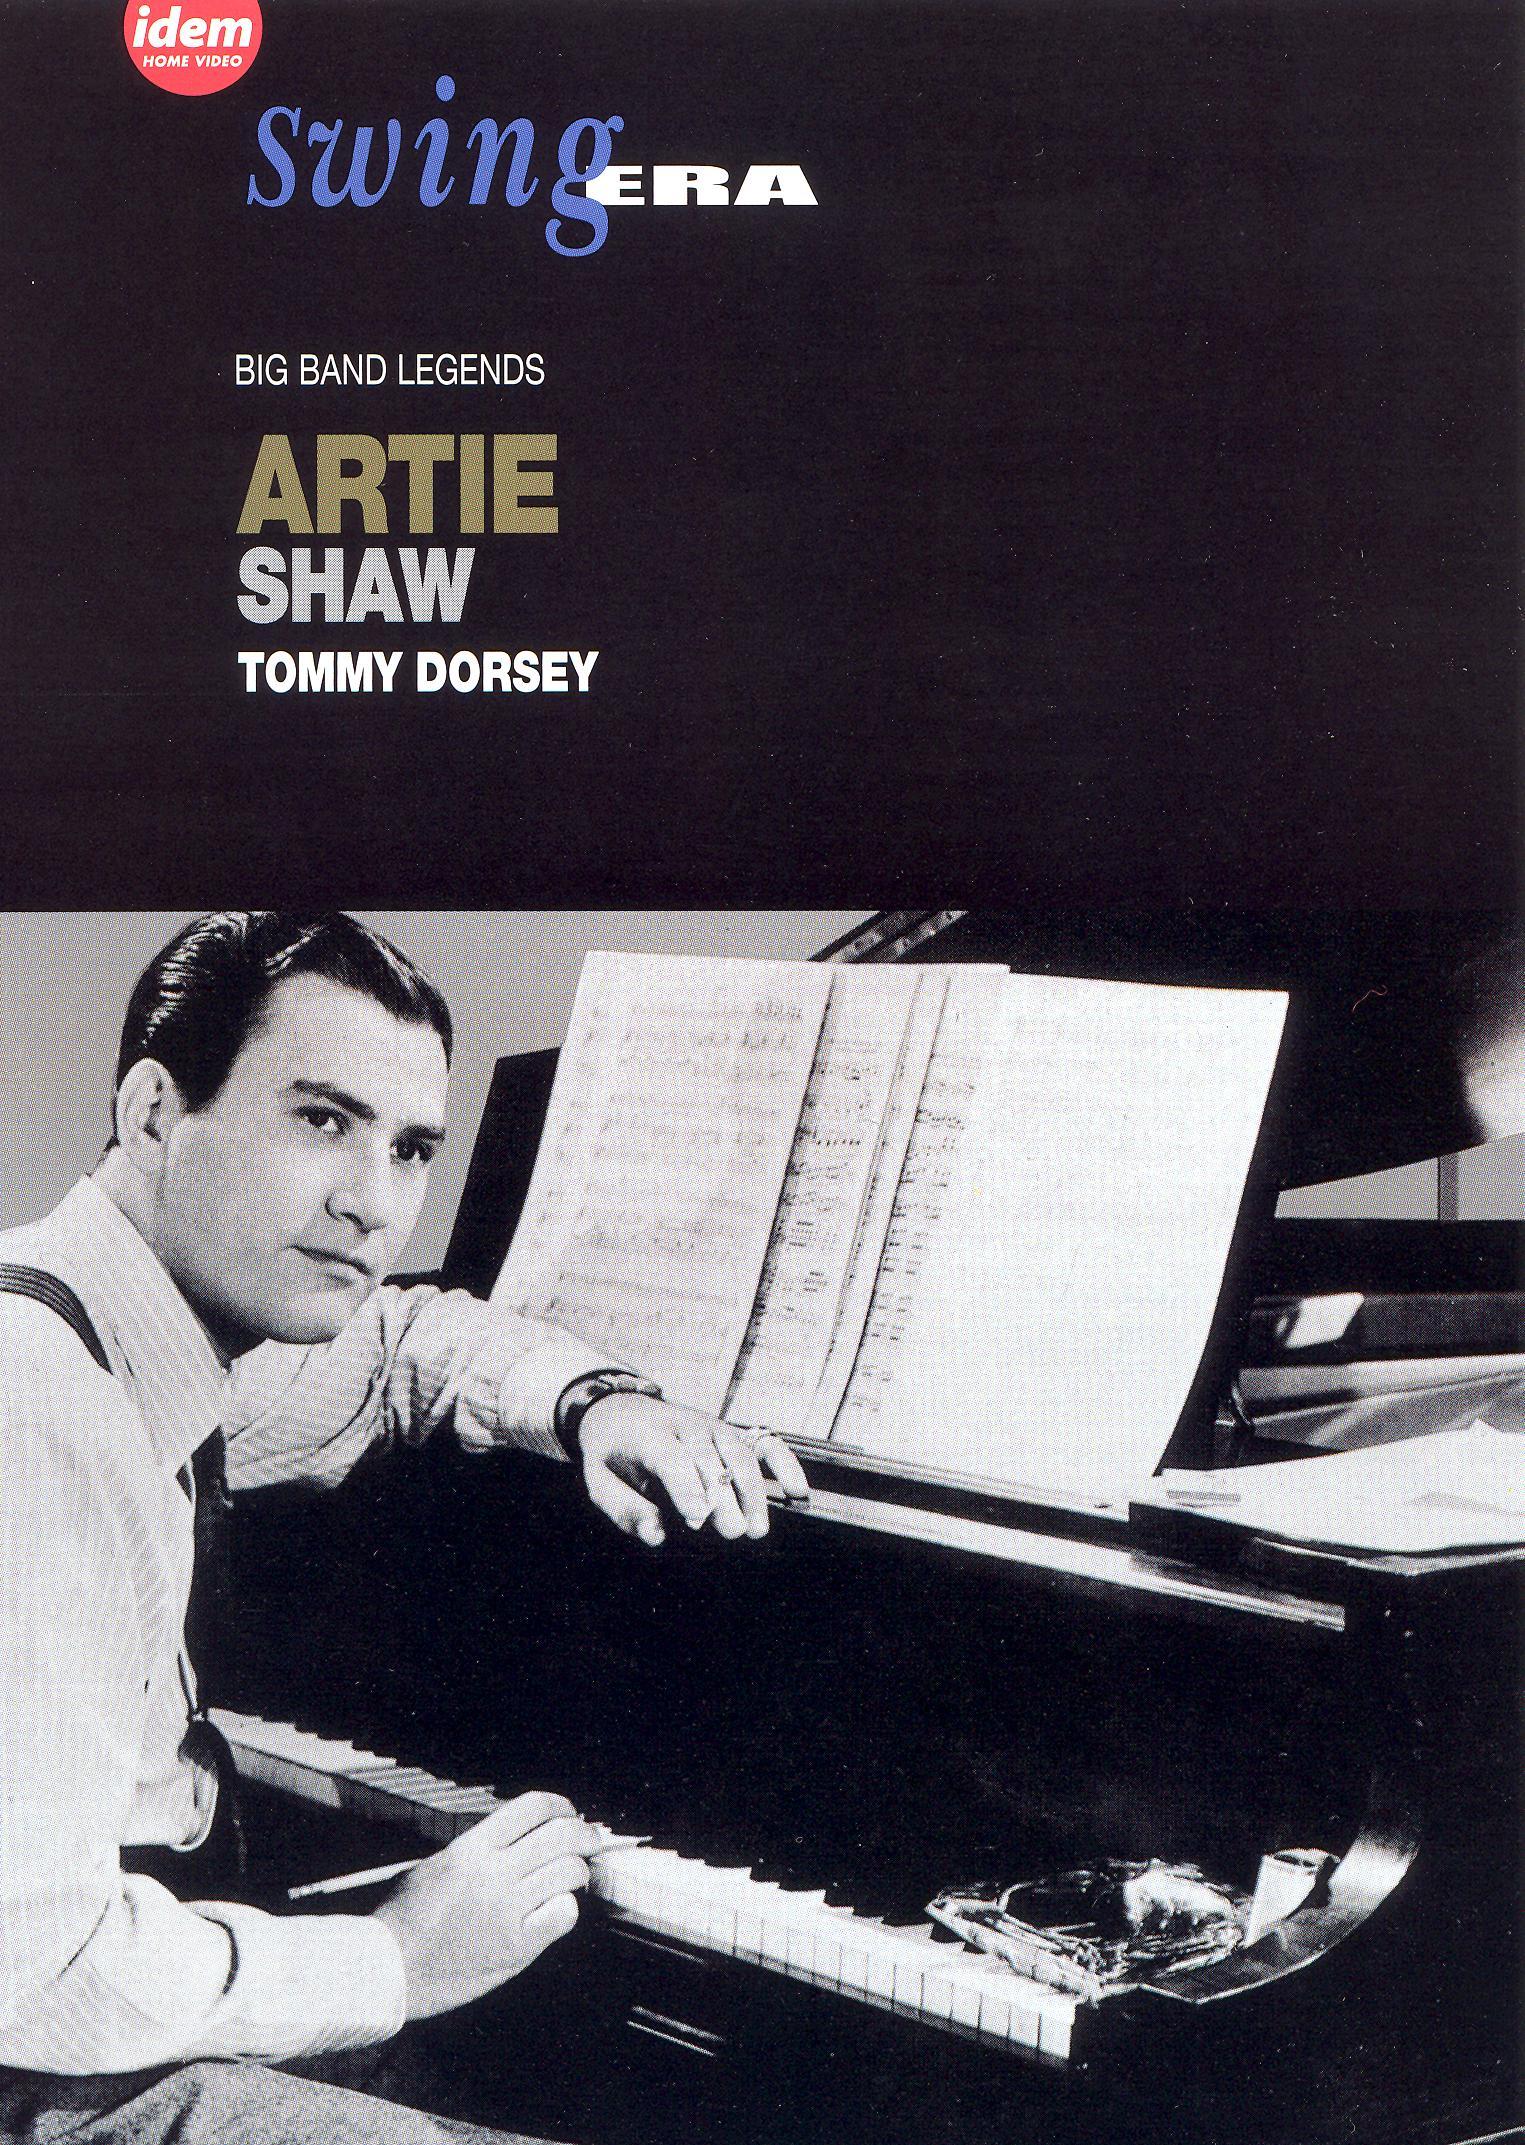 Swing Era: Artie Shaw/Tommy Dorsey - Big Band Legends